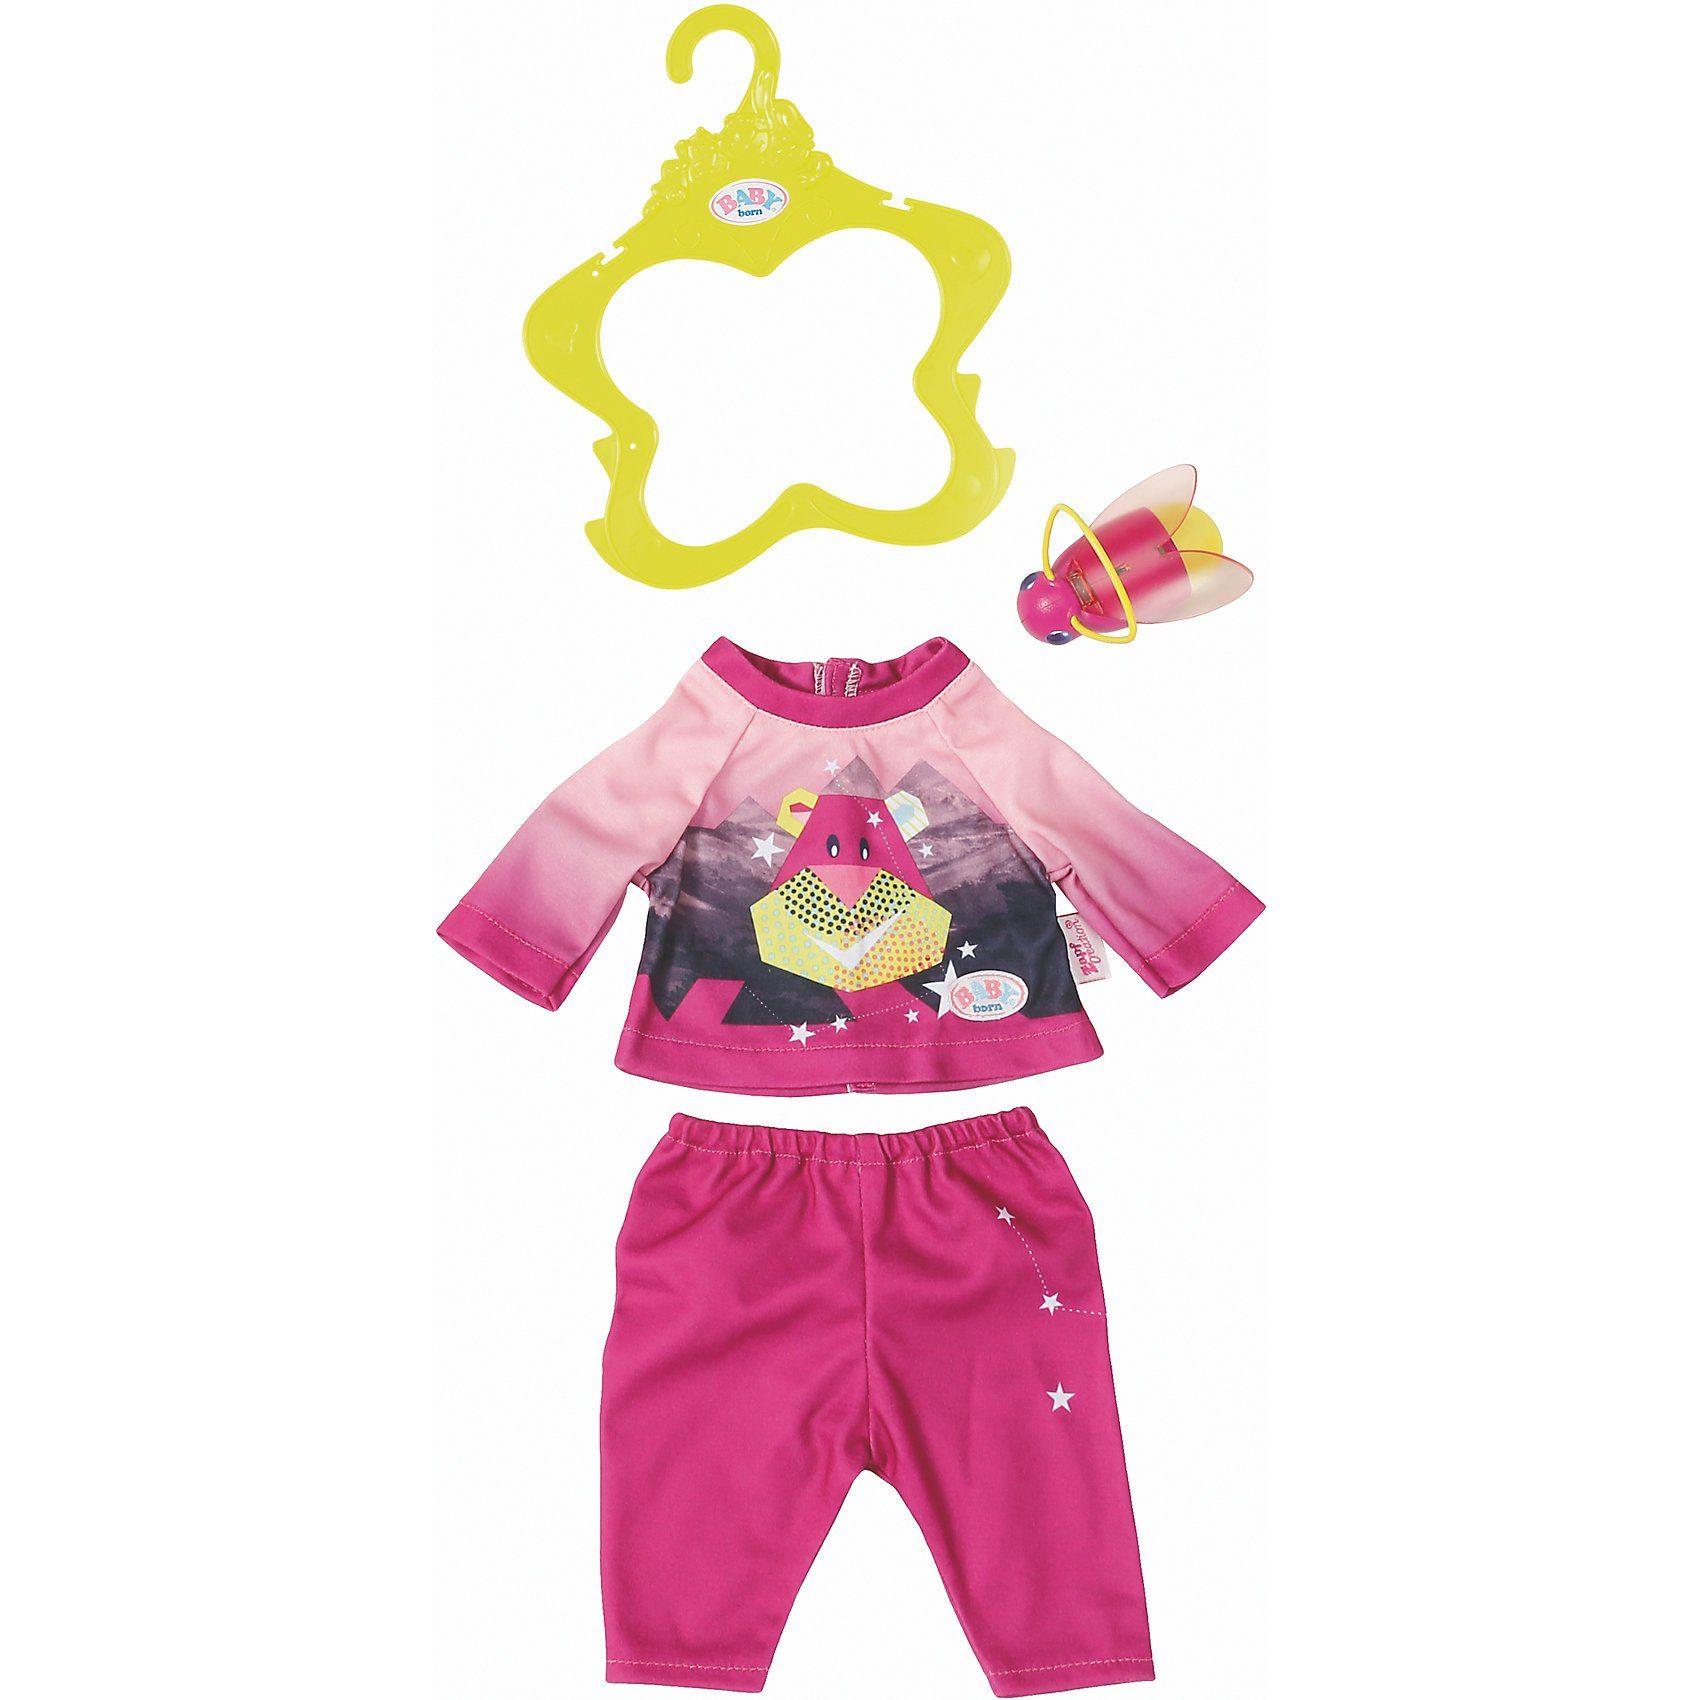 Zapf Creation® BABY born® Play&Fun Nachtlicht Outfit pink